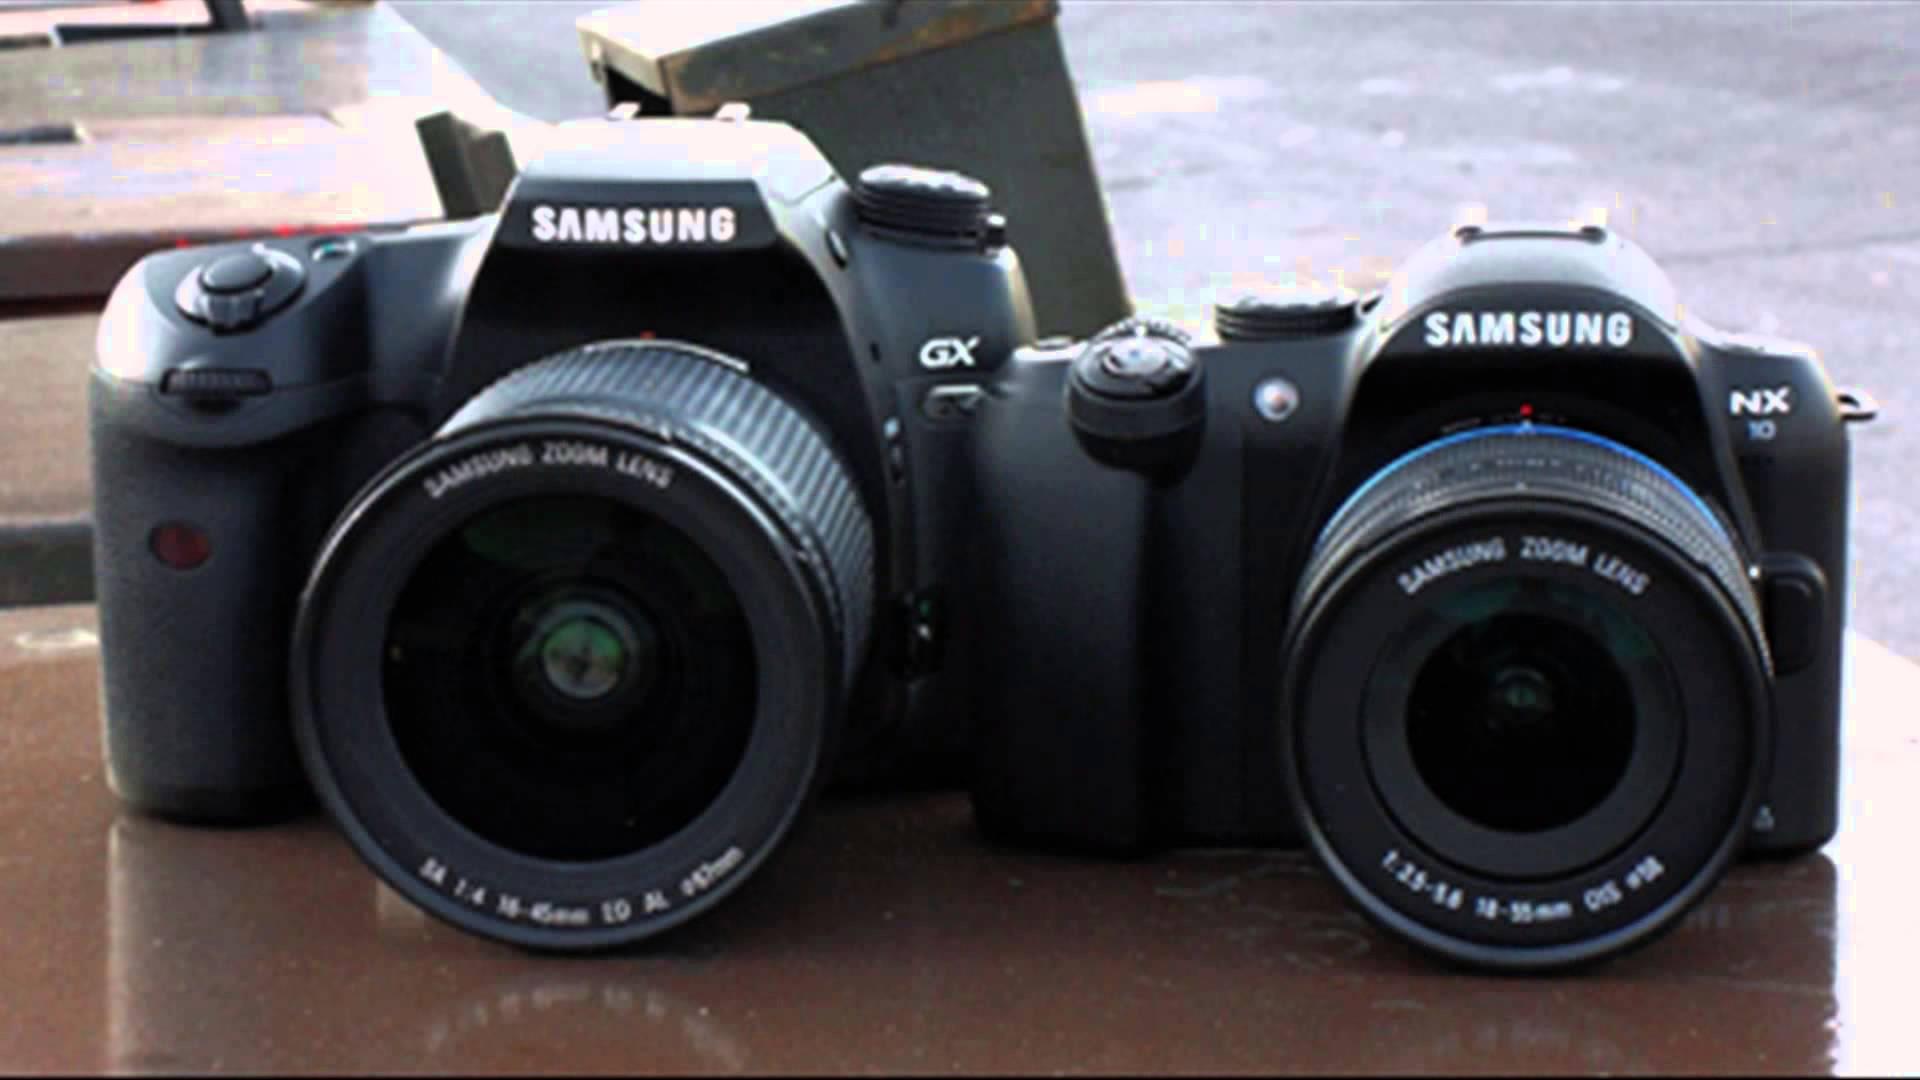 samsung gx20 body dslr photo camera